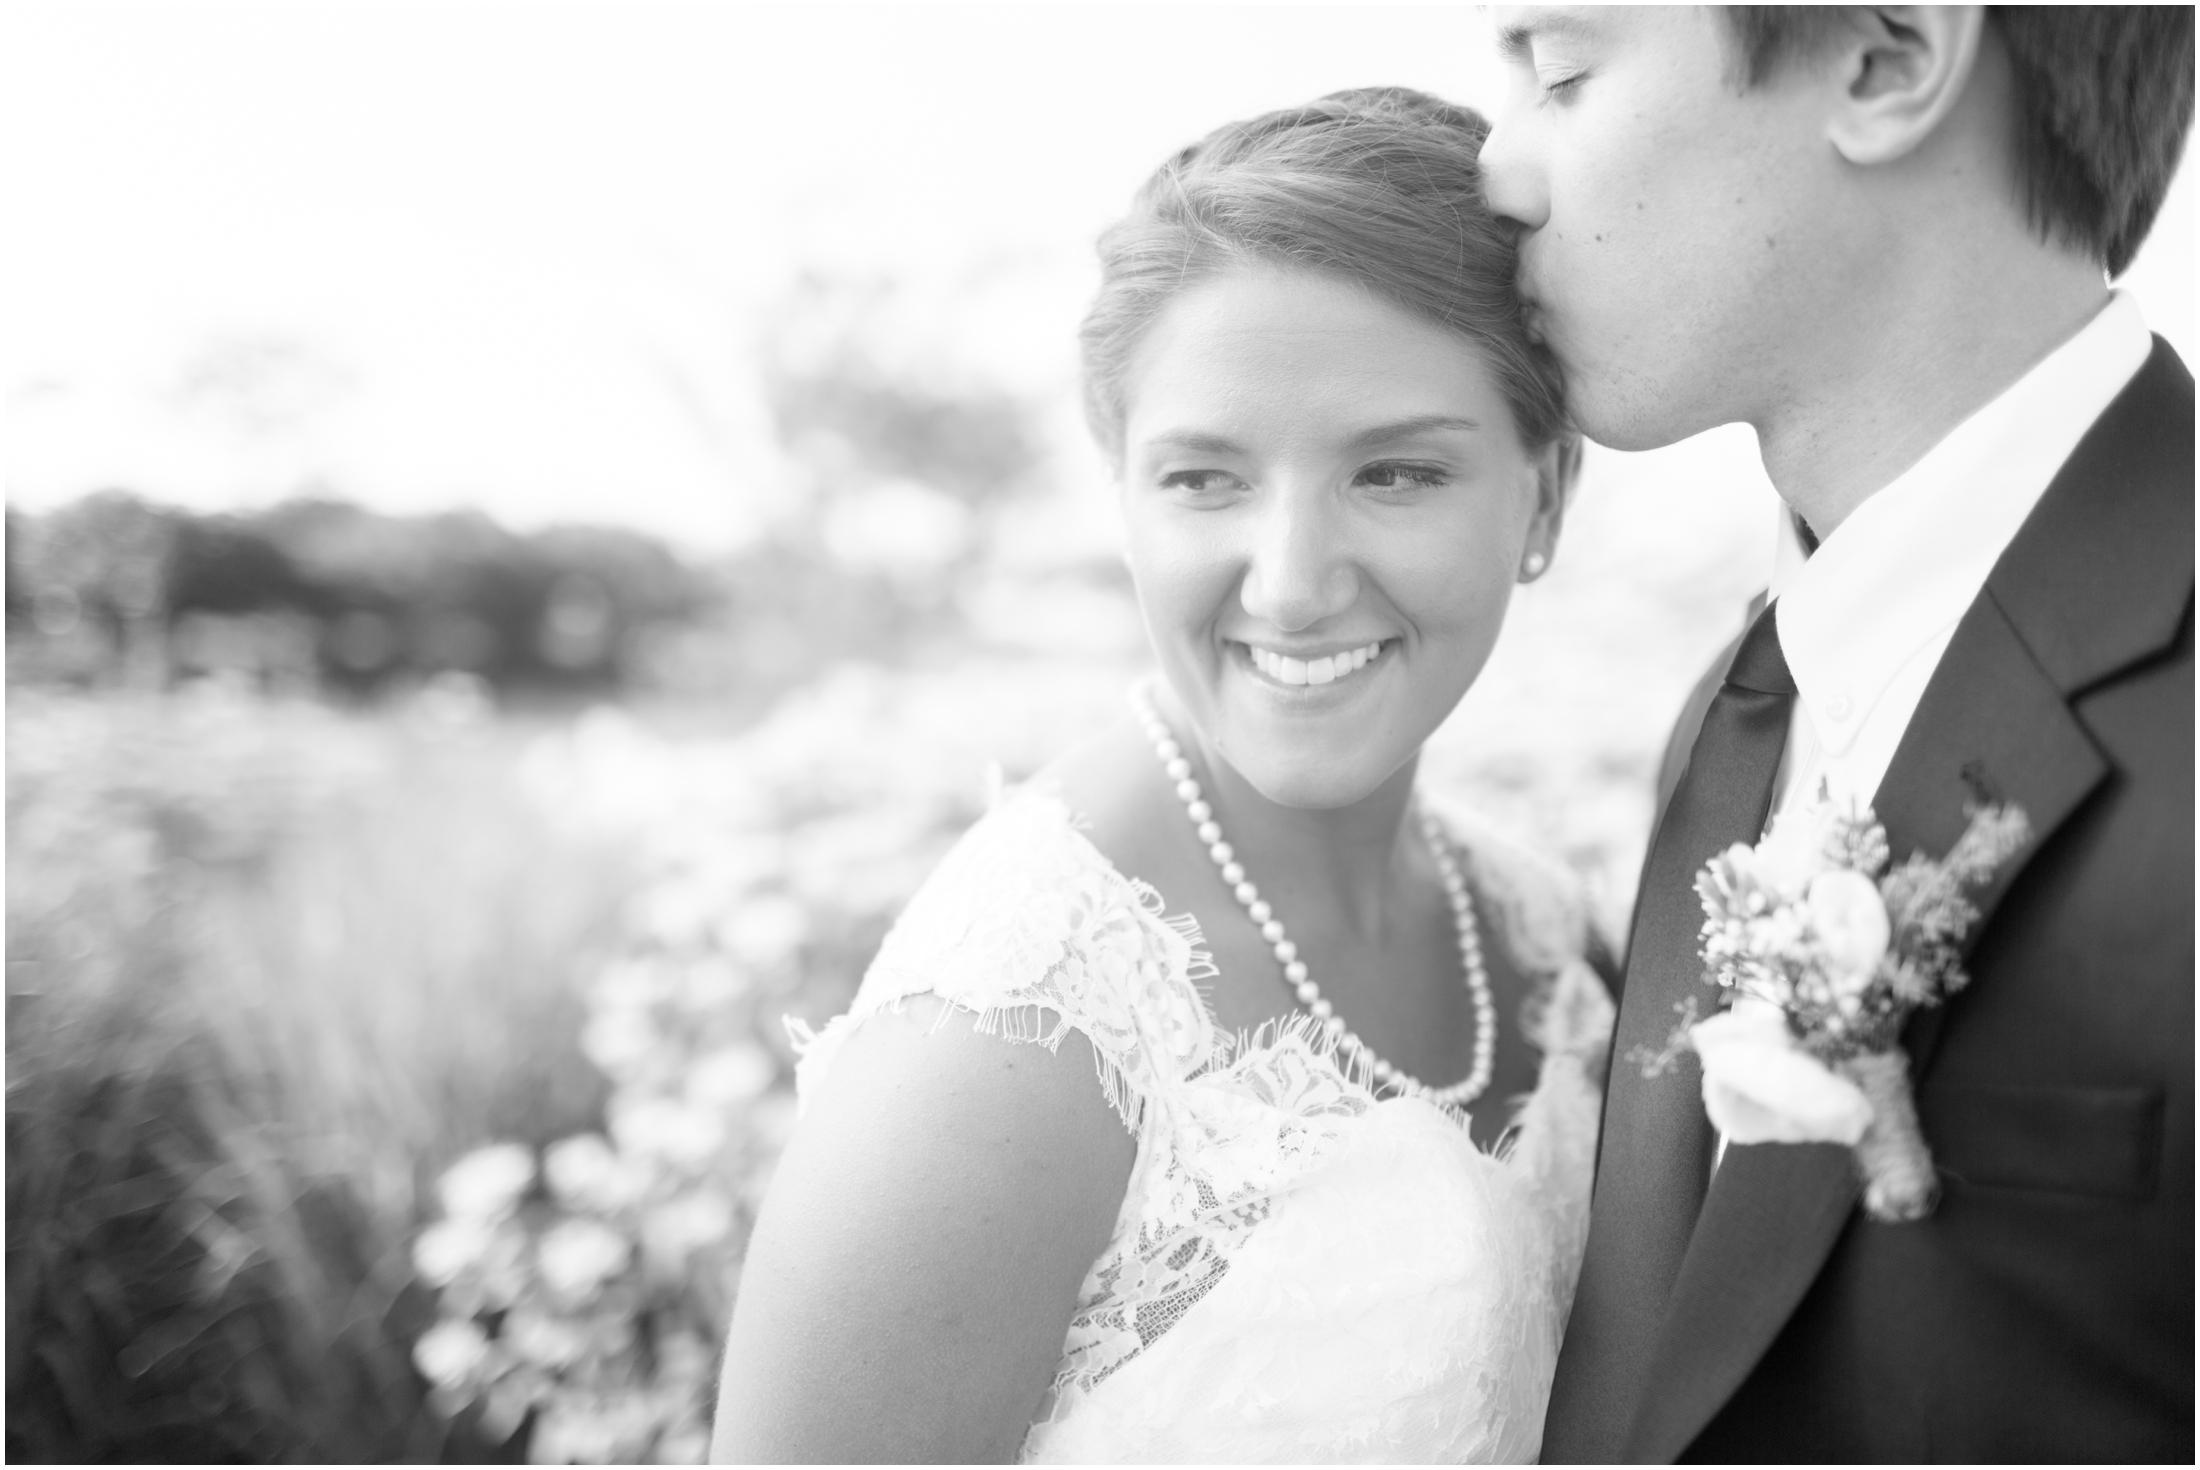 Norton-Wedding-3-Bride-and-Groom-Portraits-903.jpg